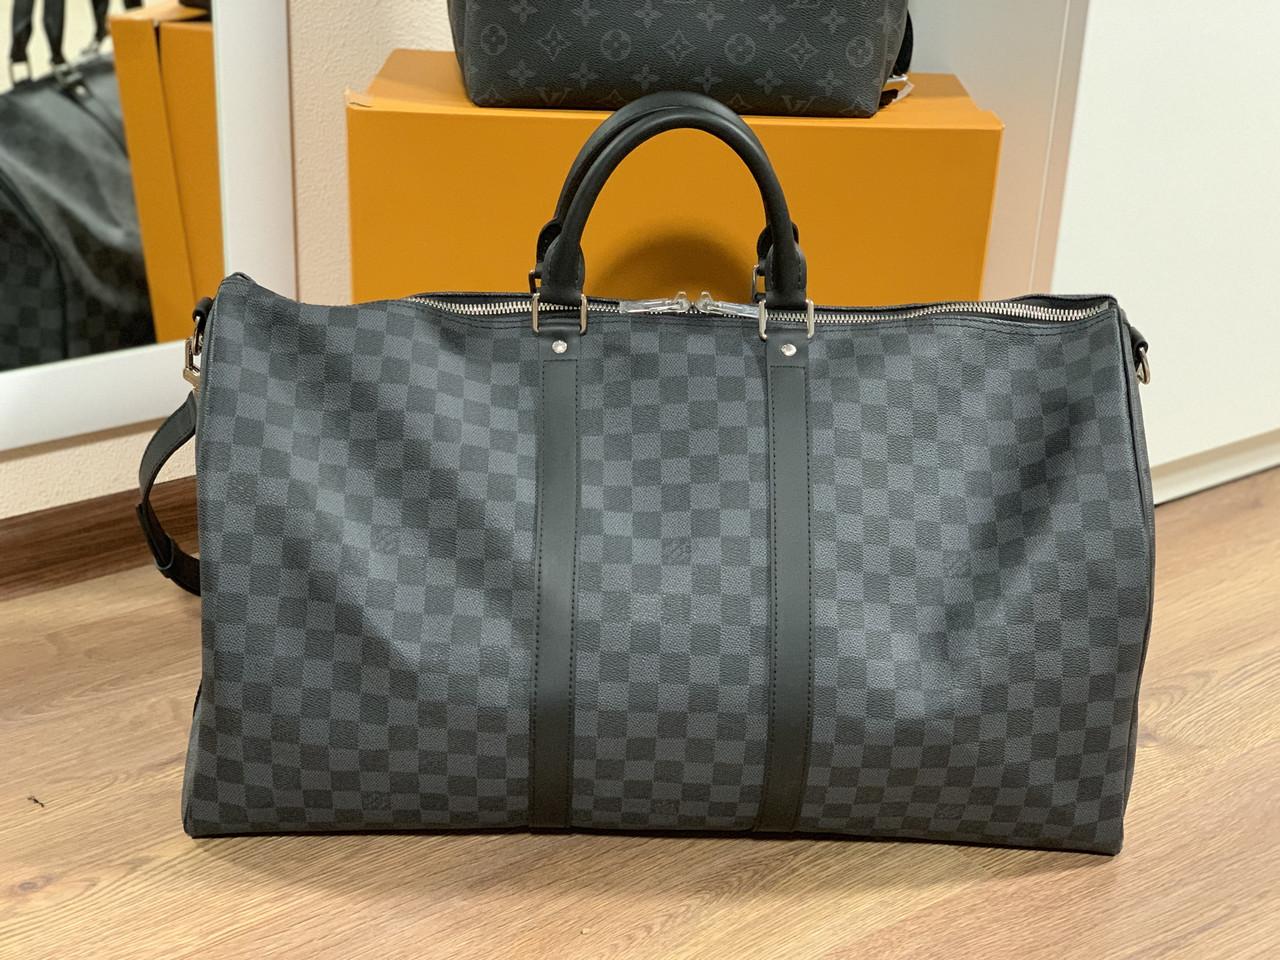 8fb64da8a182 Дорожная сумка - Louis Vuitton Keepall | vkstore.com.ua